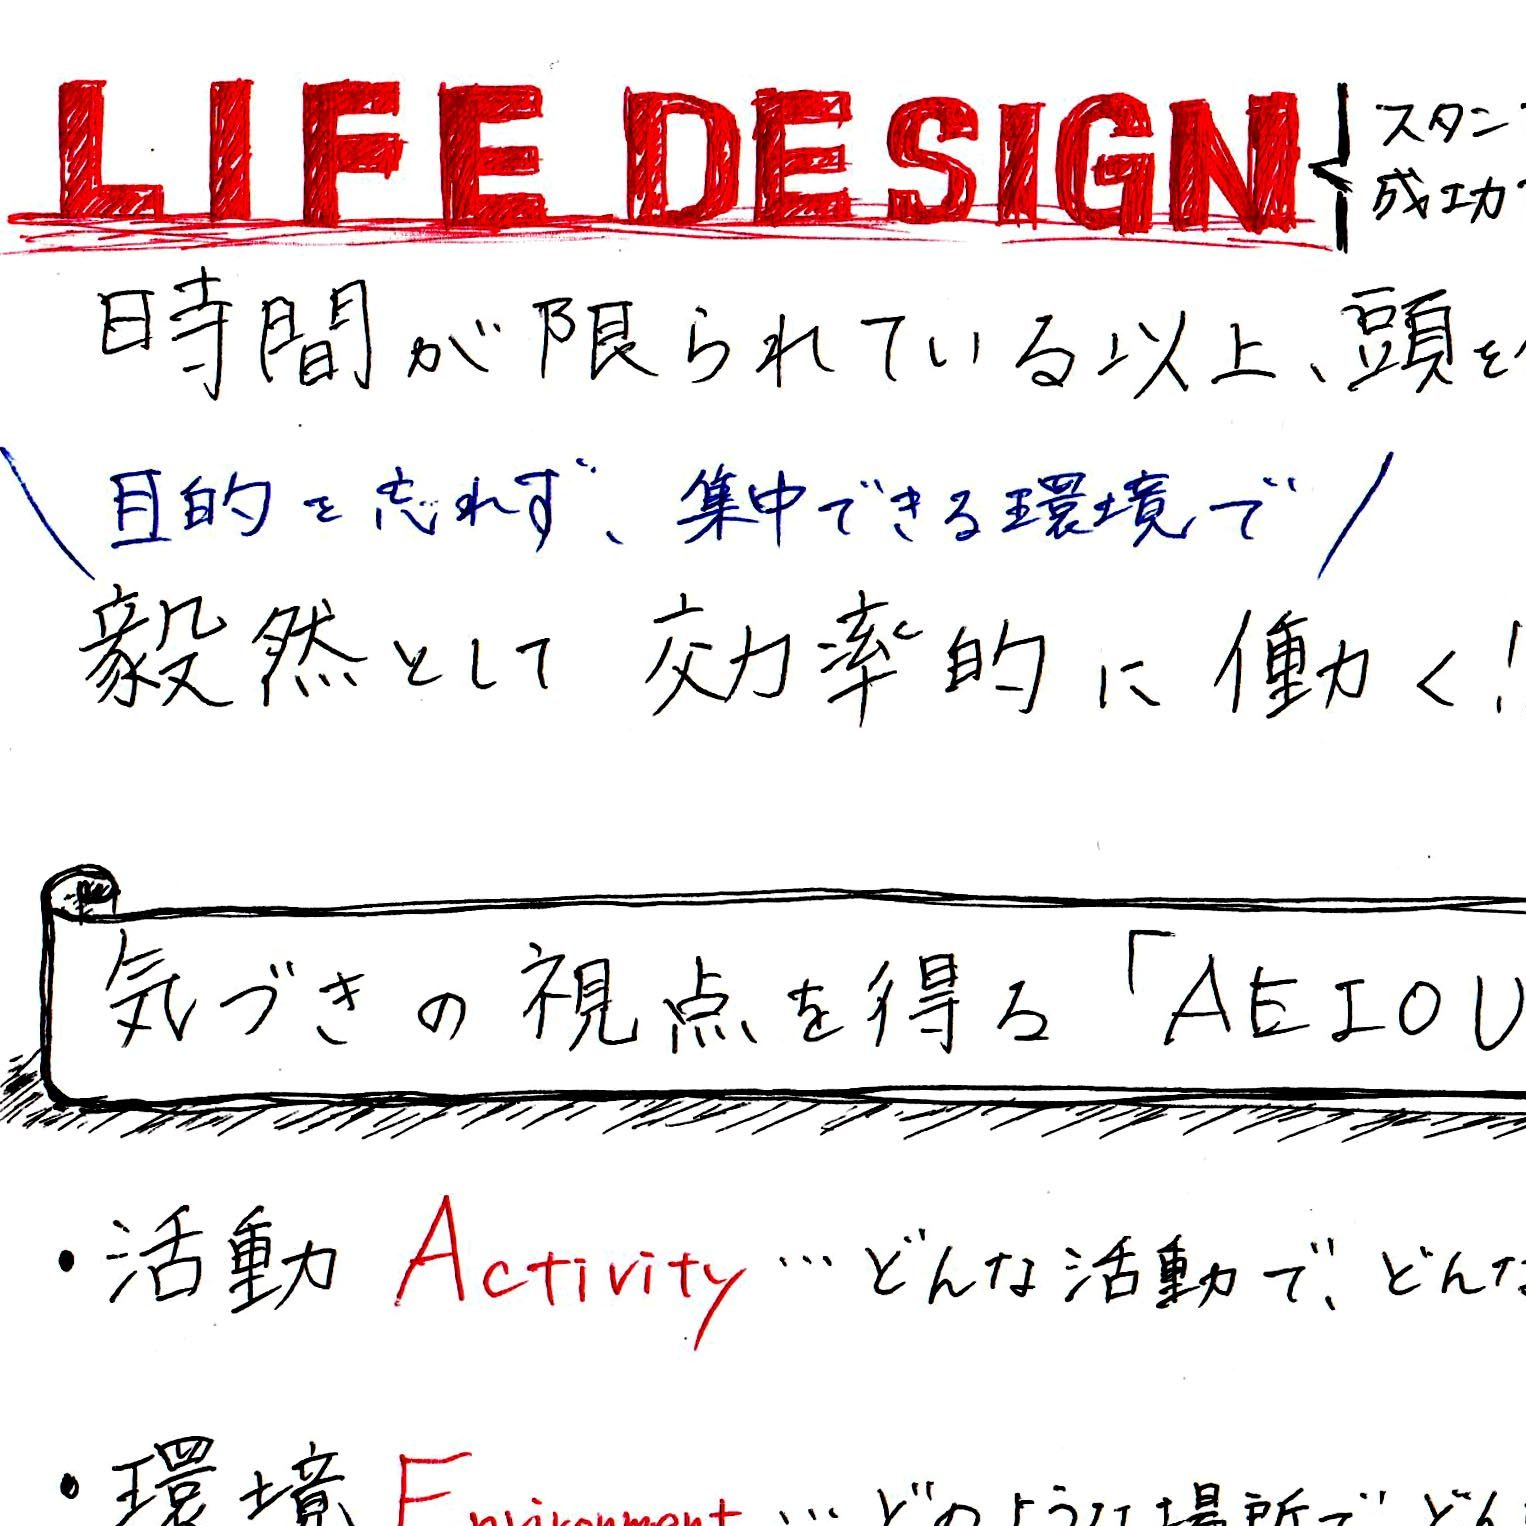 LIFE DESIGN スタンフォードで学ぶ人生設計術 記事の内容まとめ&レビュー